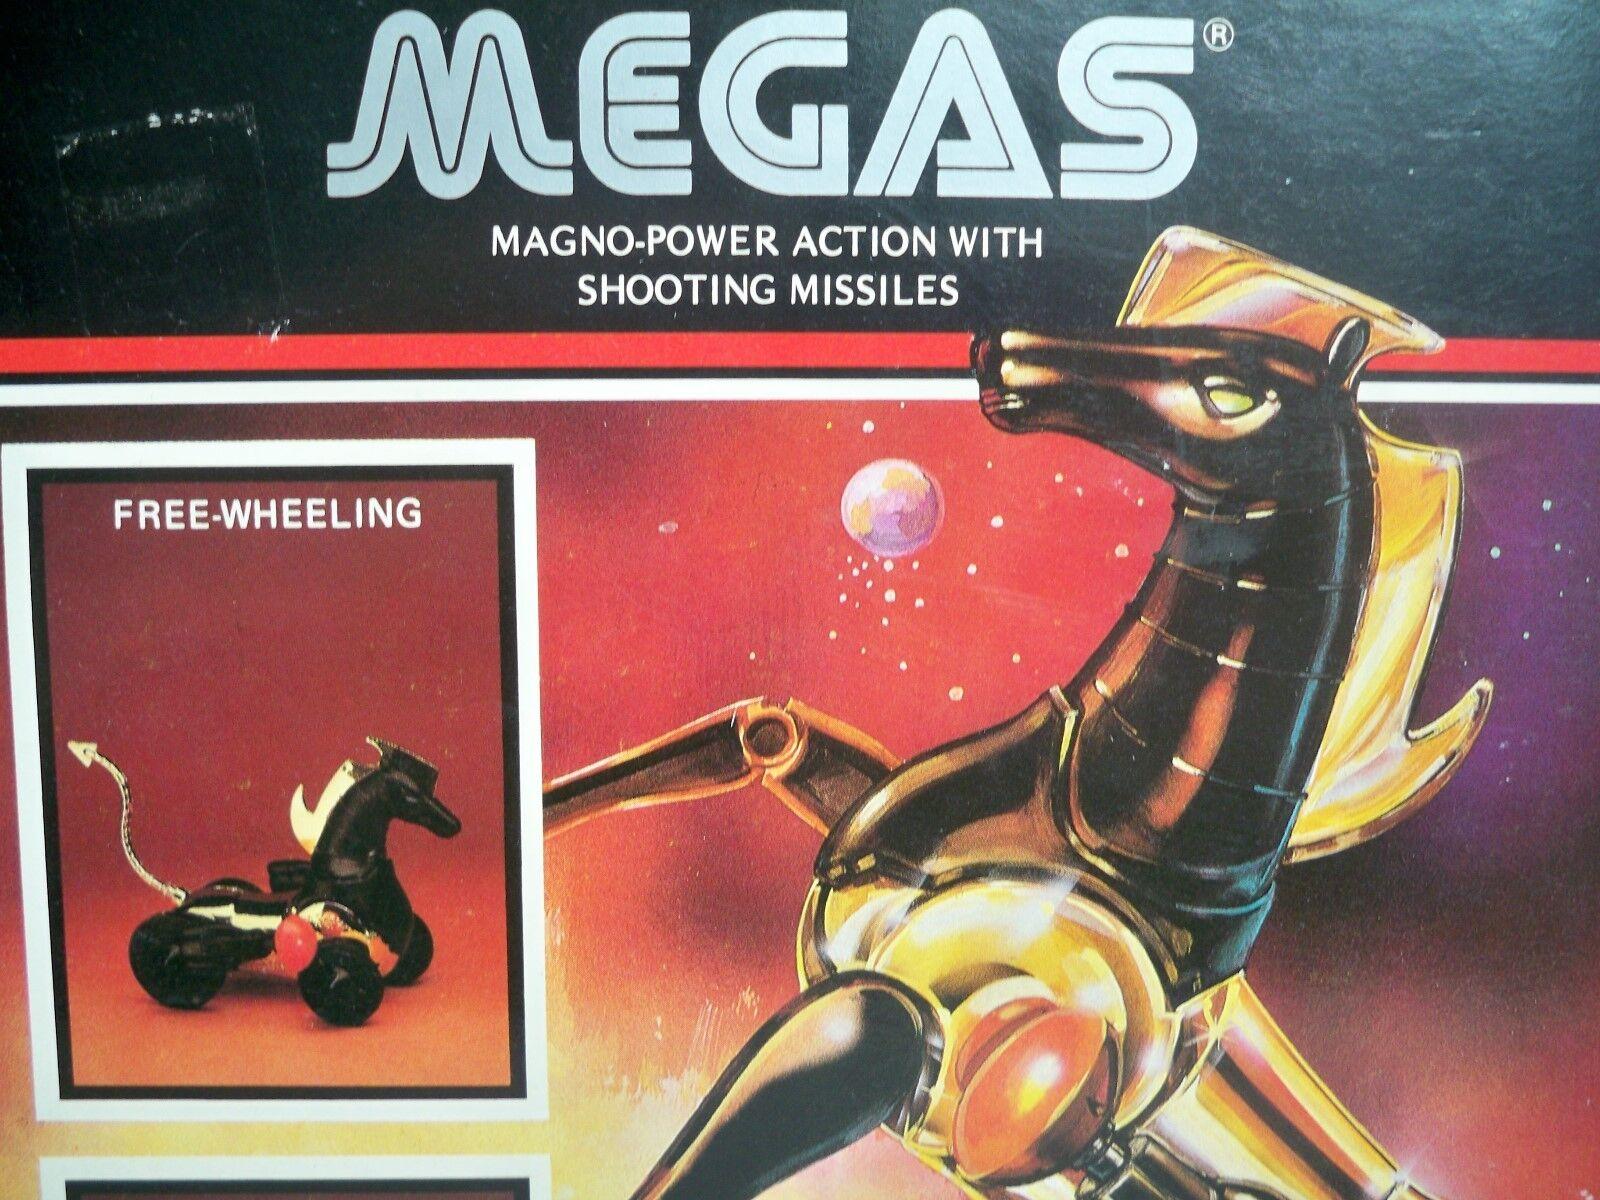 K1849001 MEGAS W BOX MICRONAUTS MEGO VINTAGE 1981 ORIGINAL